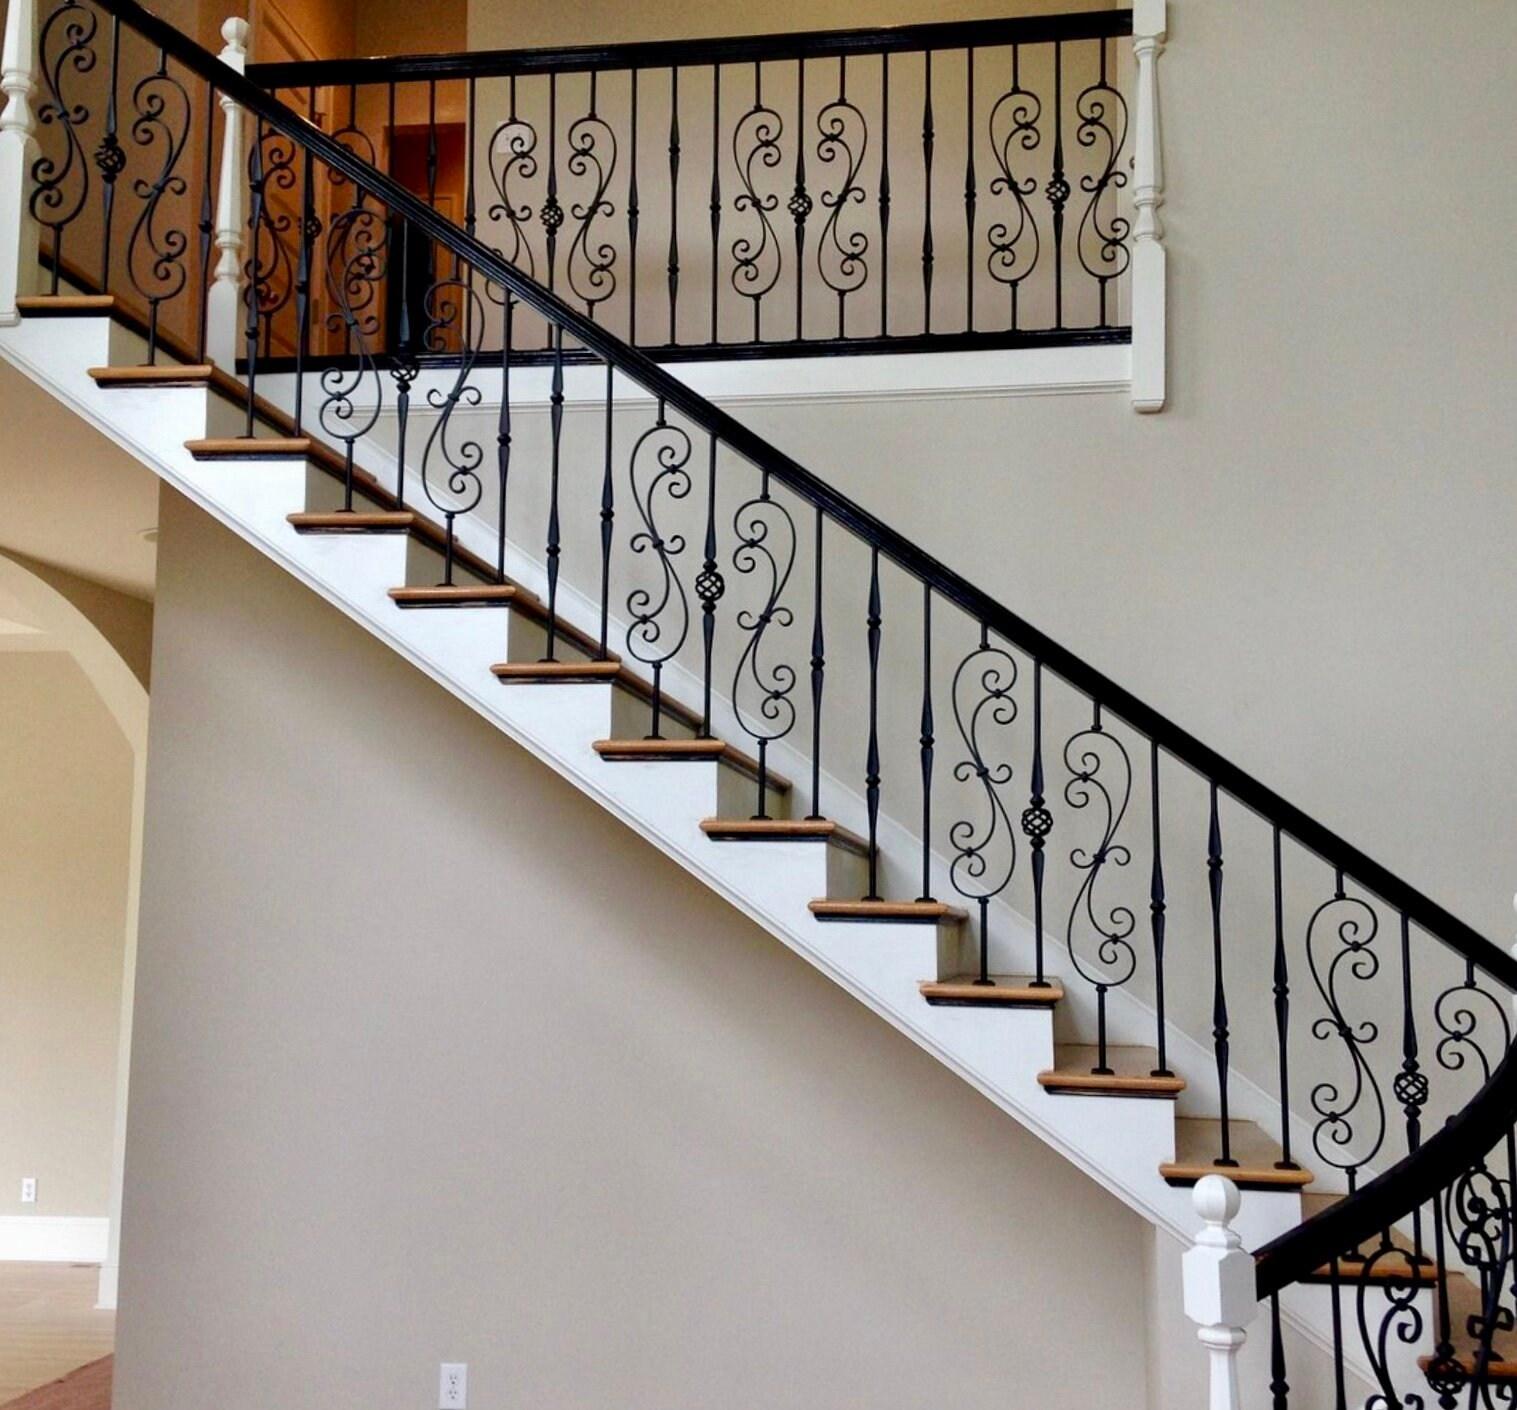 Wrought Iron Balusters Charlotte Nc Stair Railings | Installing Metal Balusters Wood Railing | Stair Treads | Deck Railing | Iron Baluster | Iron Stair Spindles | Stair Rail